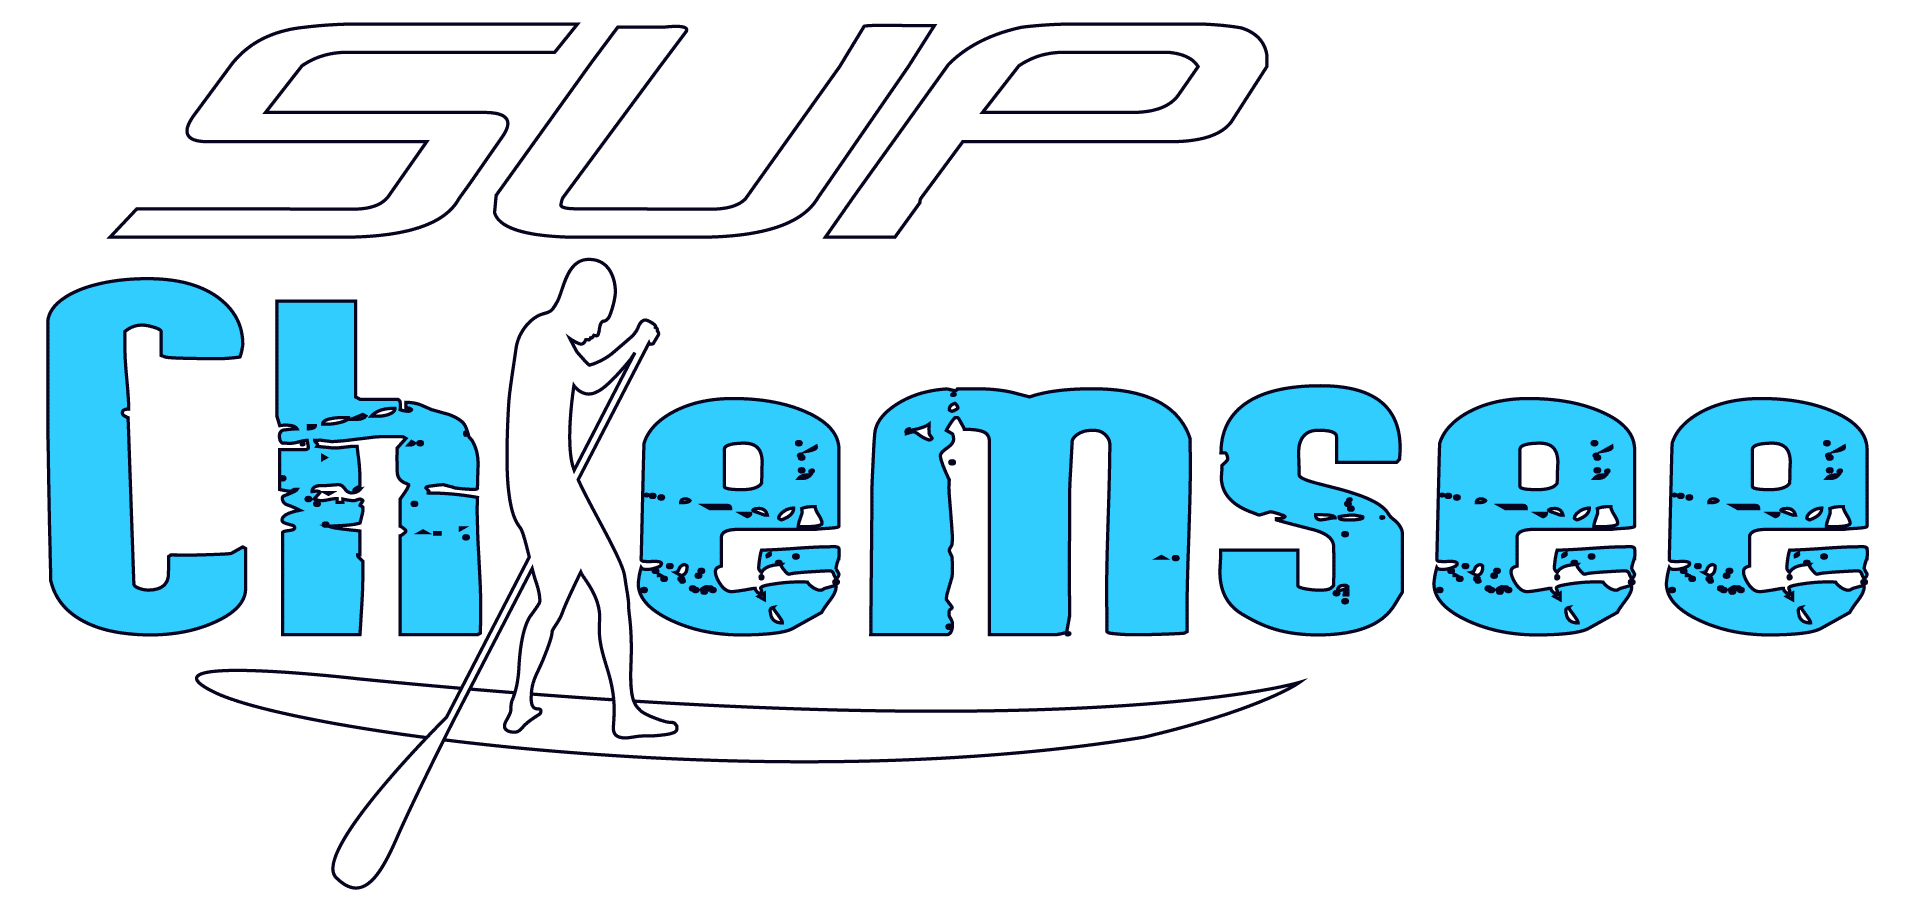 SUP Board Chiemsee